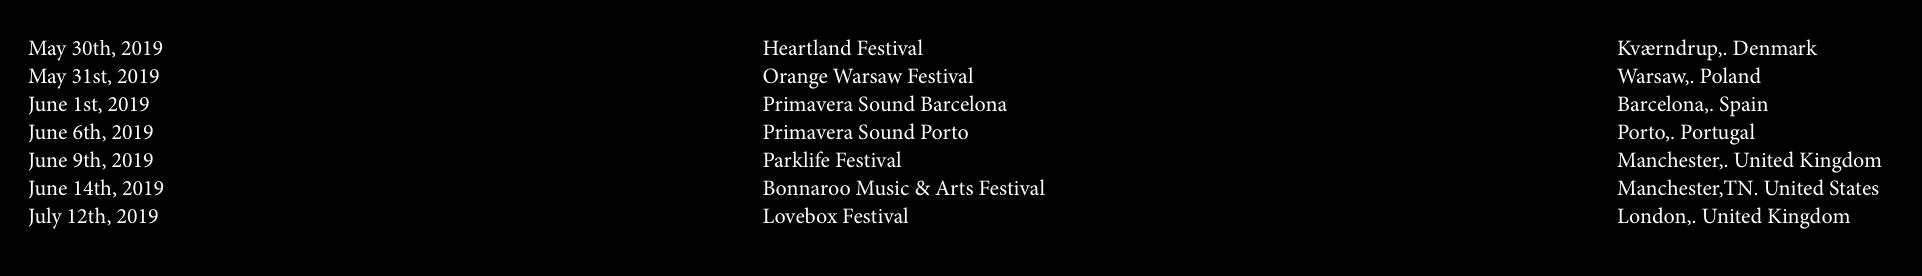 Solange 2019 European Festival tour